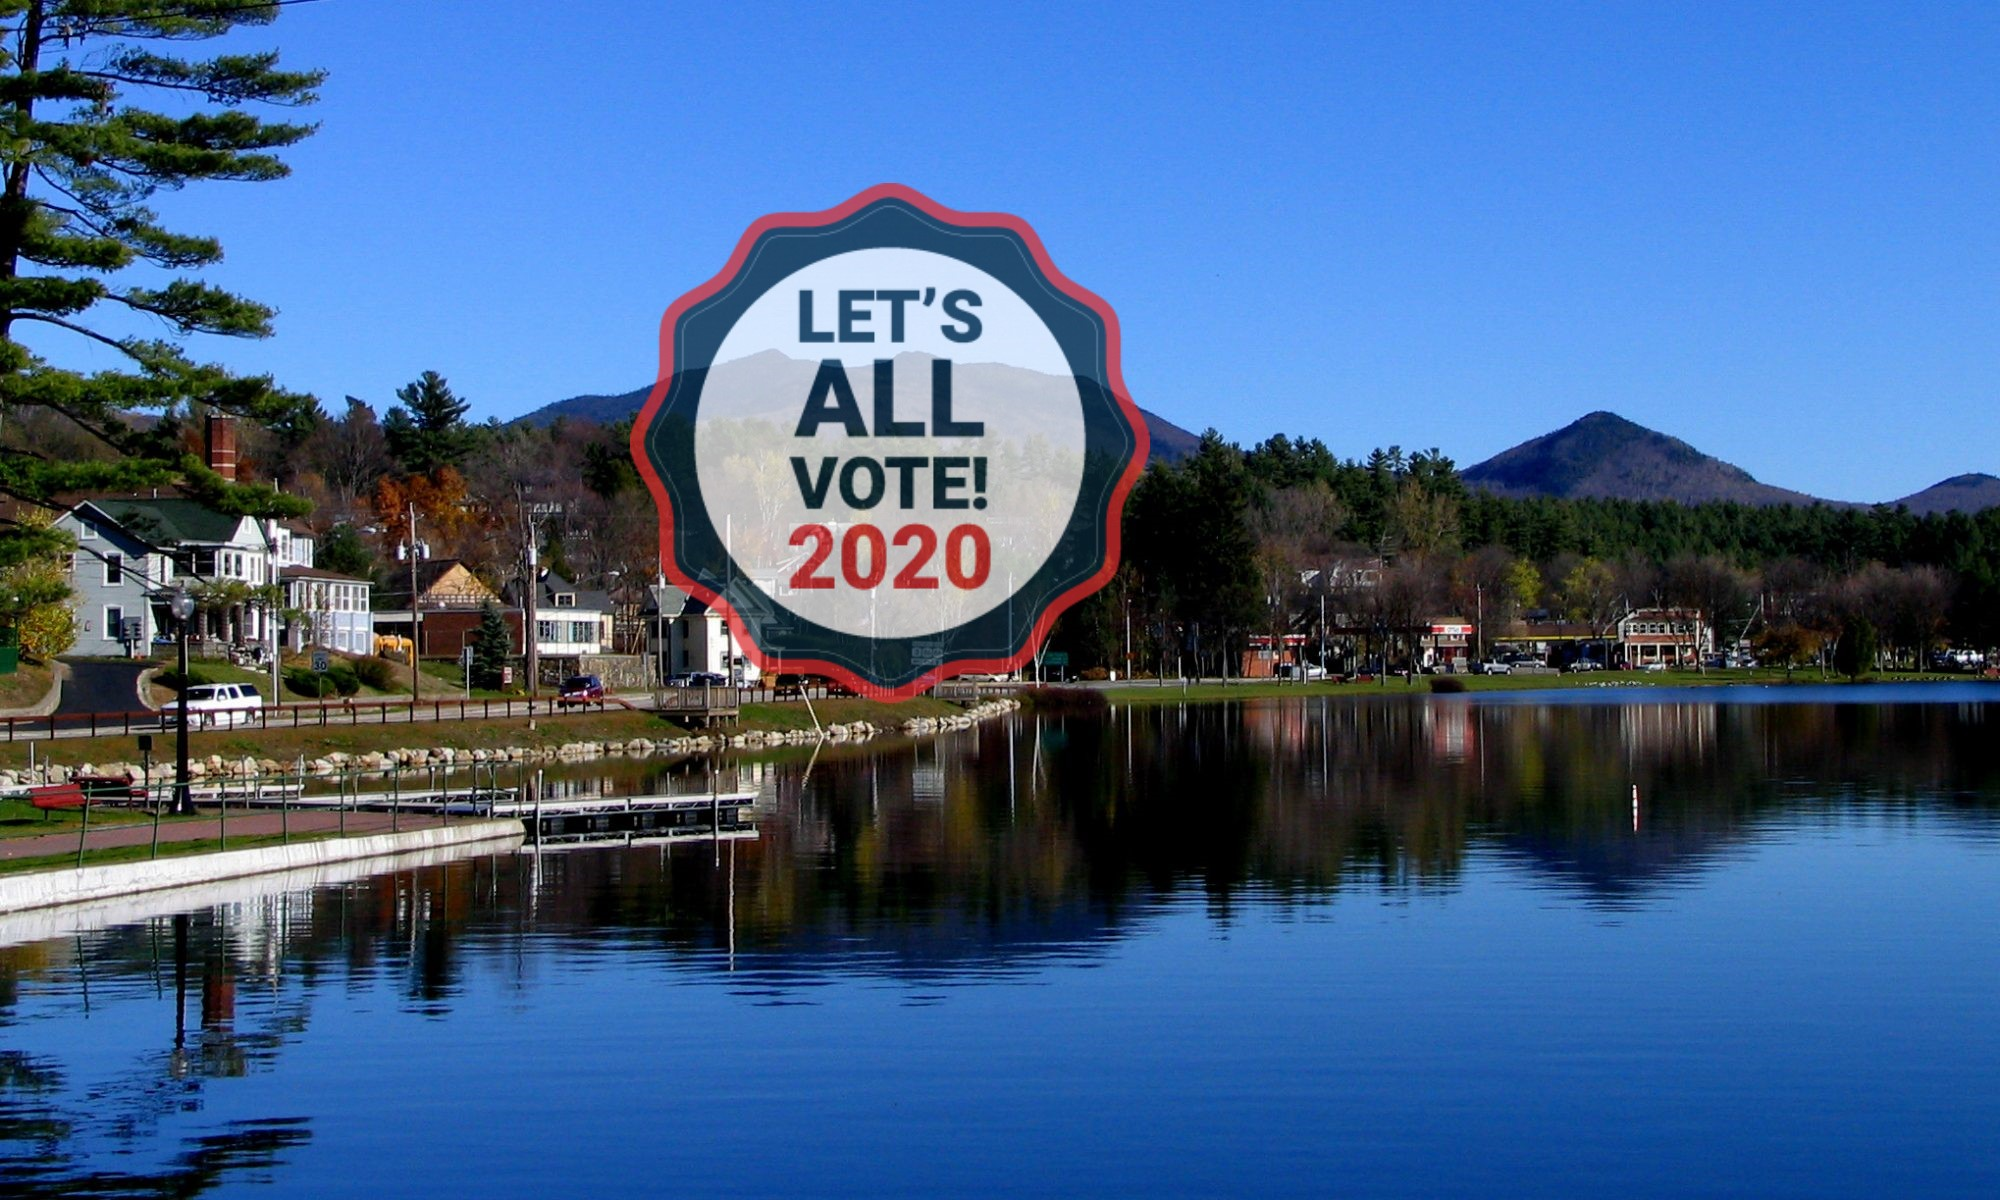 Adirondack Voters for Change